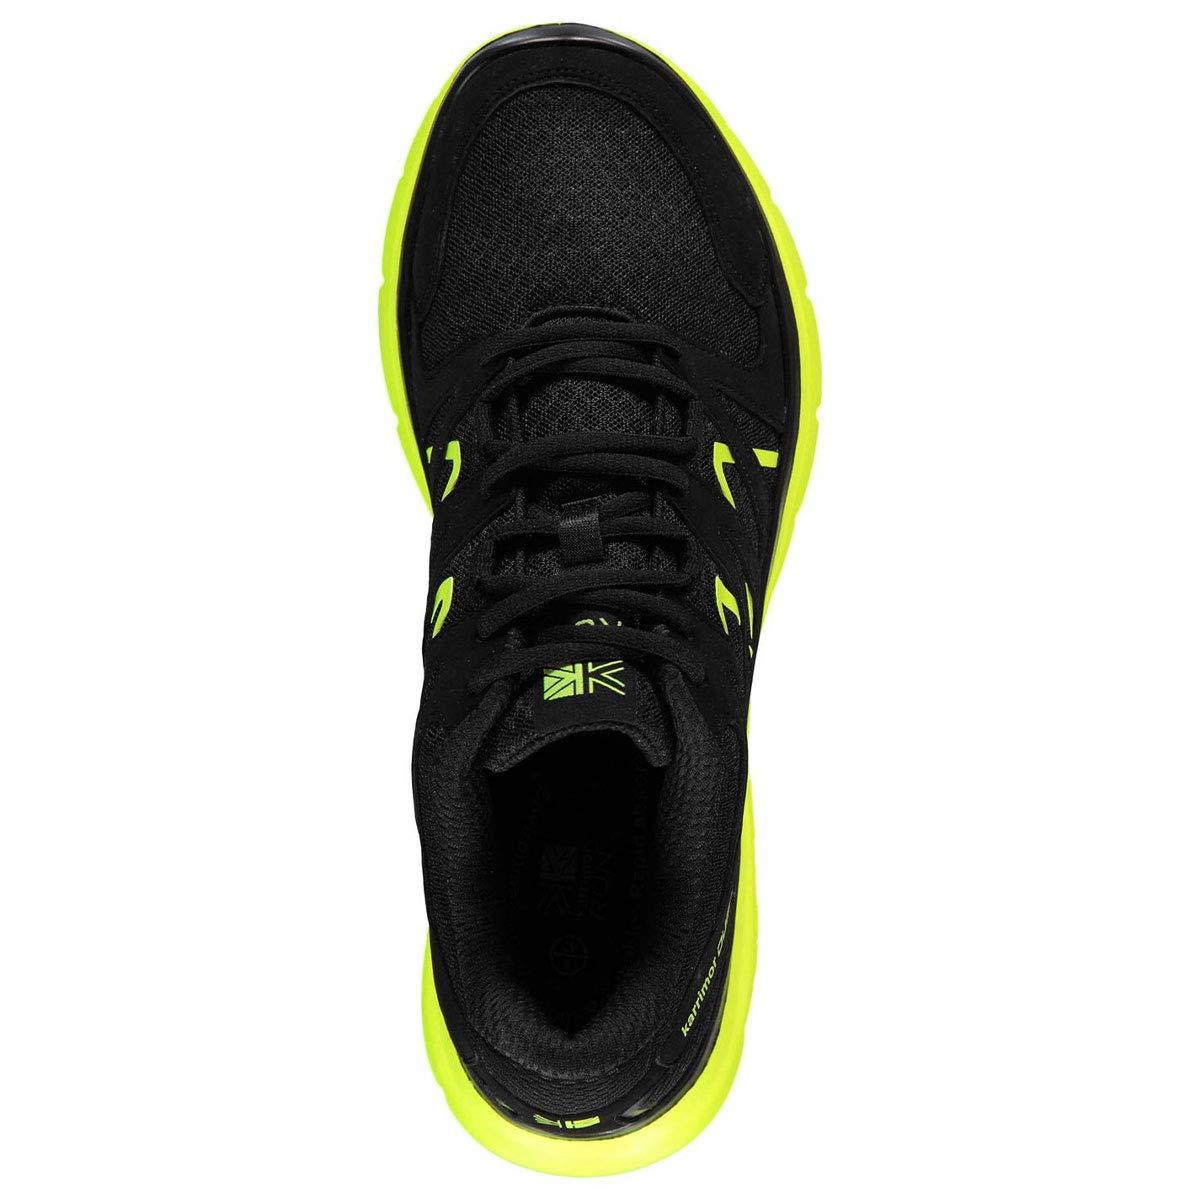 WEEDKEYCAT Yin Yang Dragon Adult Short Socks Cotton Gym Socks for Mens Womens Yoga Hiking Cycling Running Soccer Sports